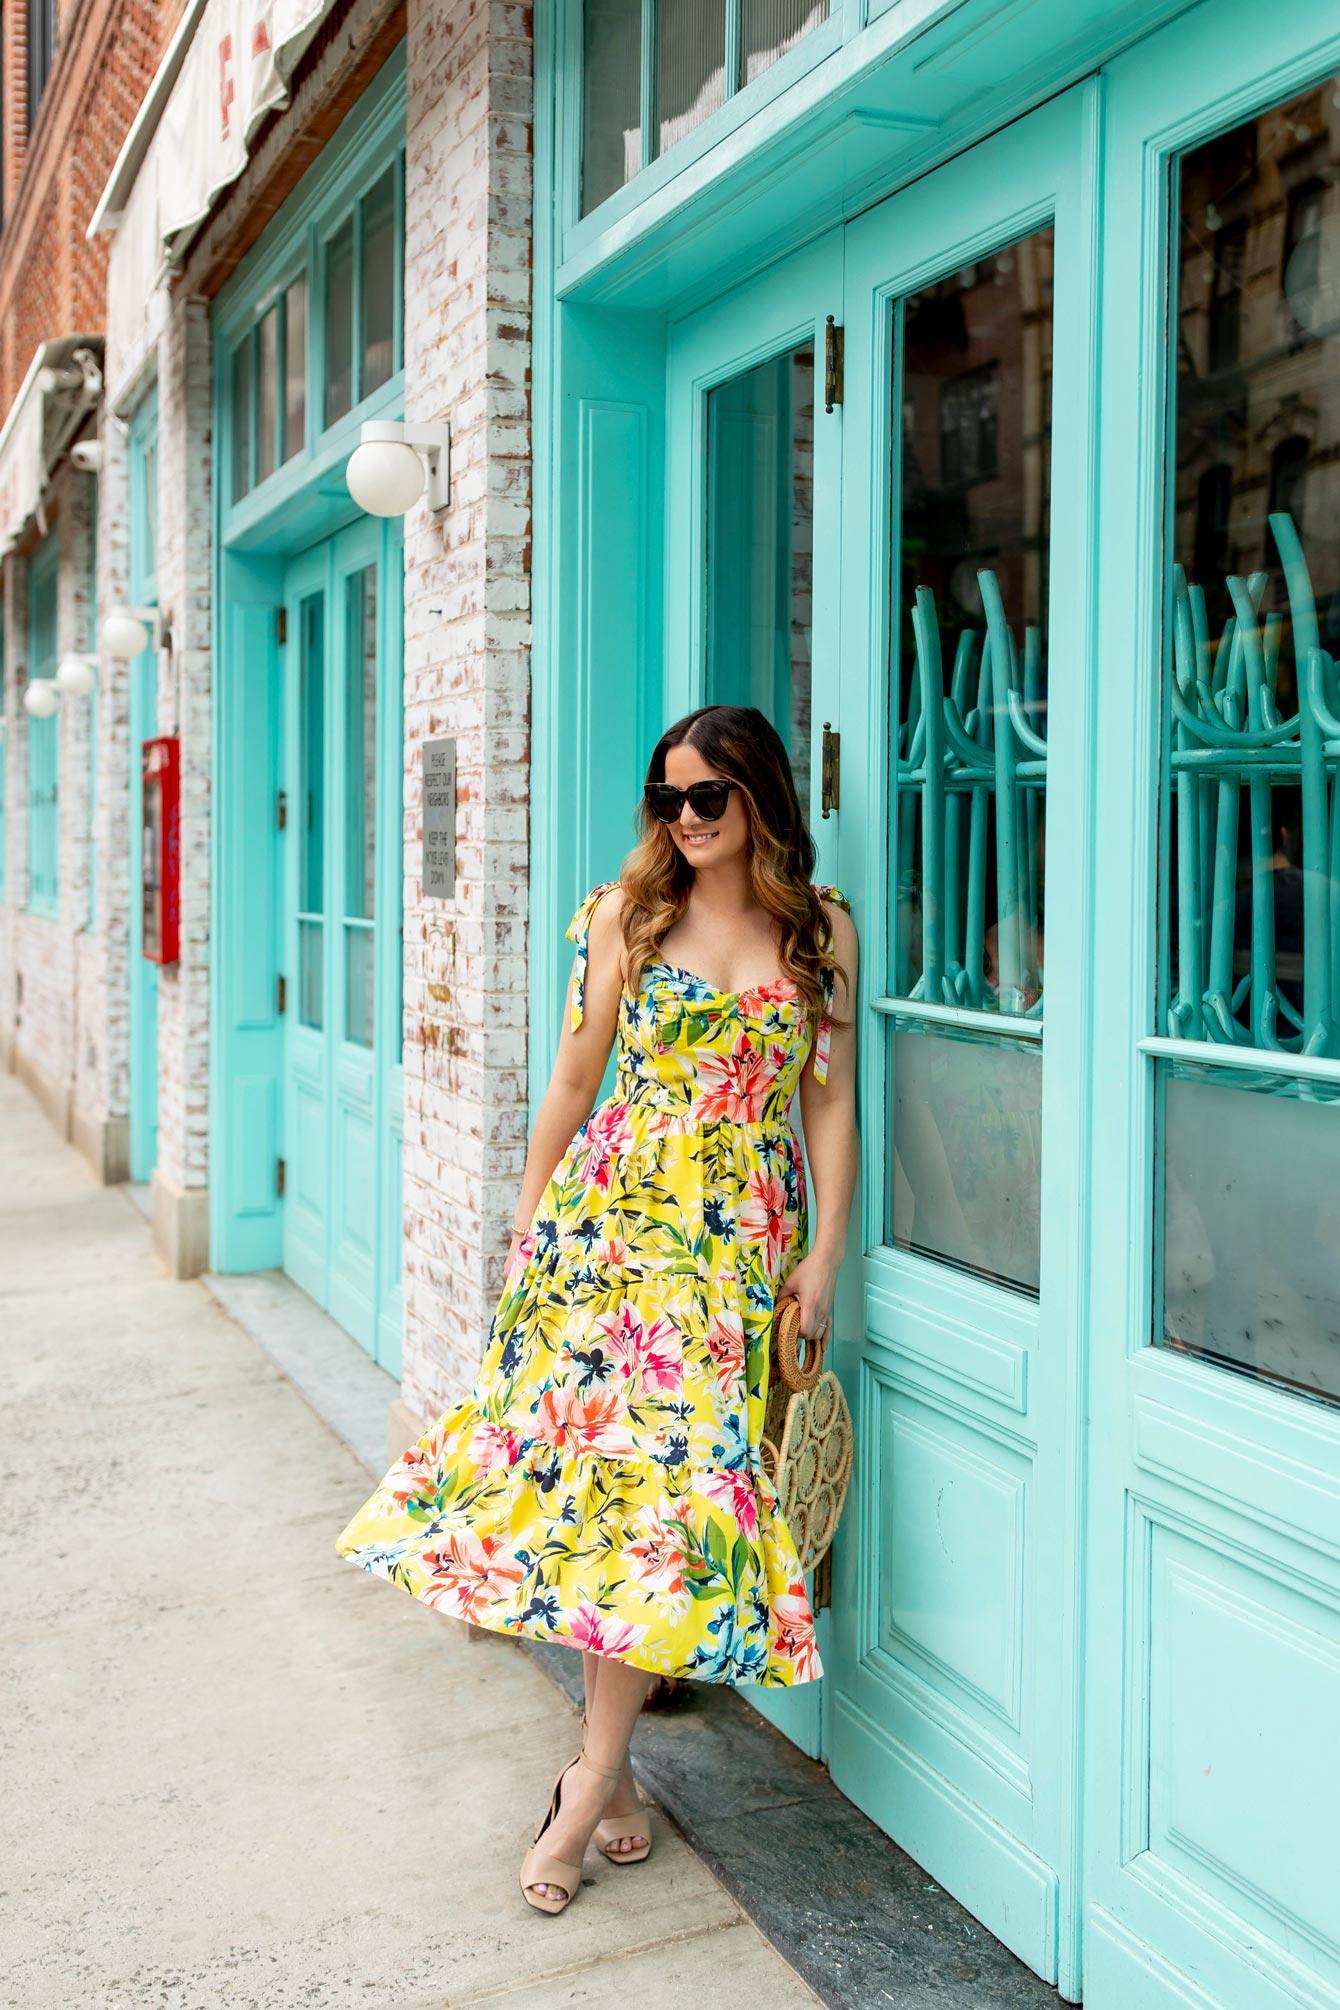 Best Colorful Doors New York City